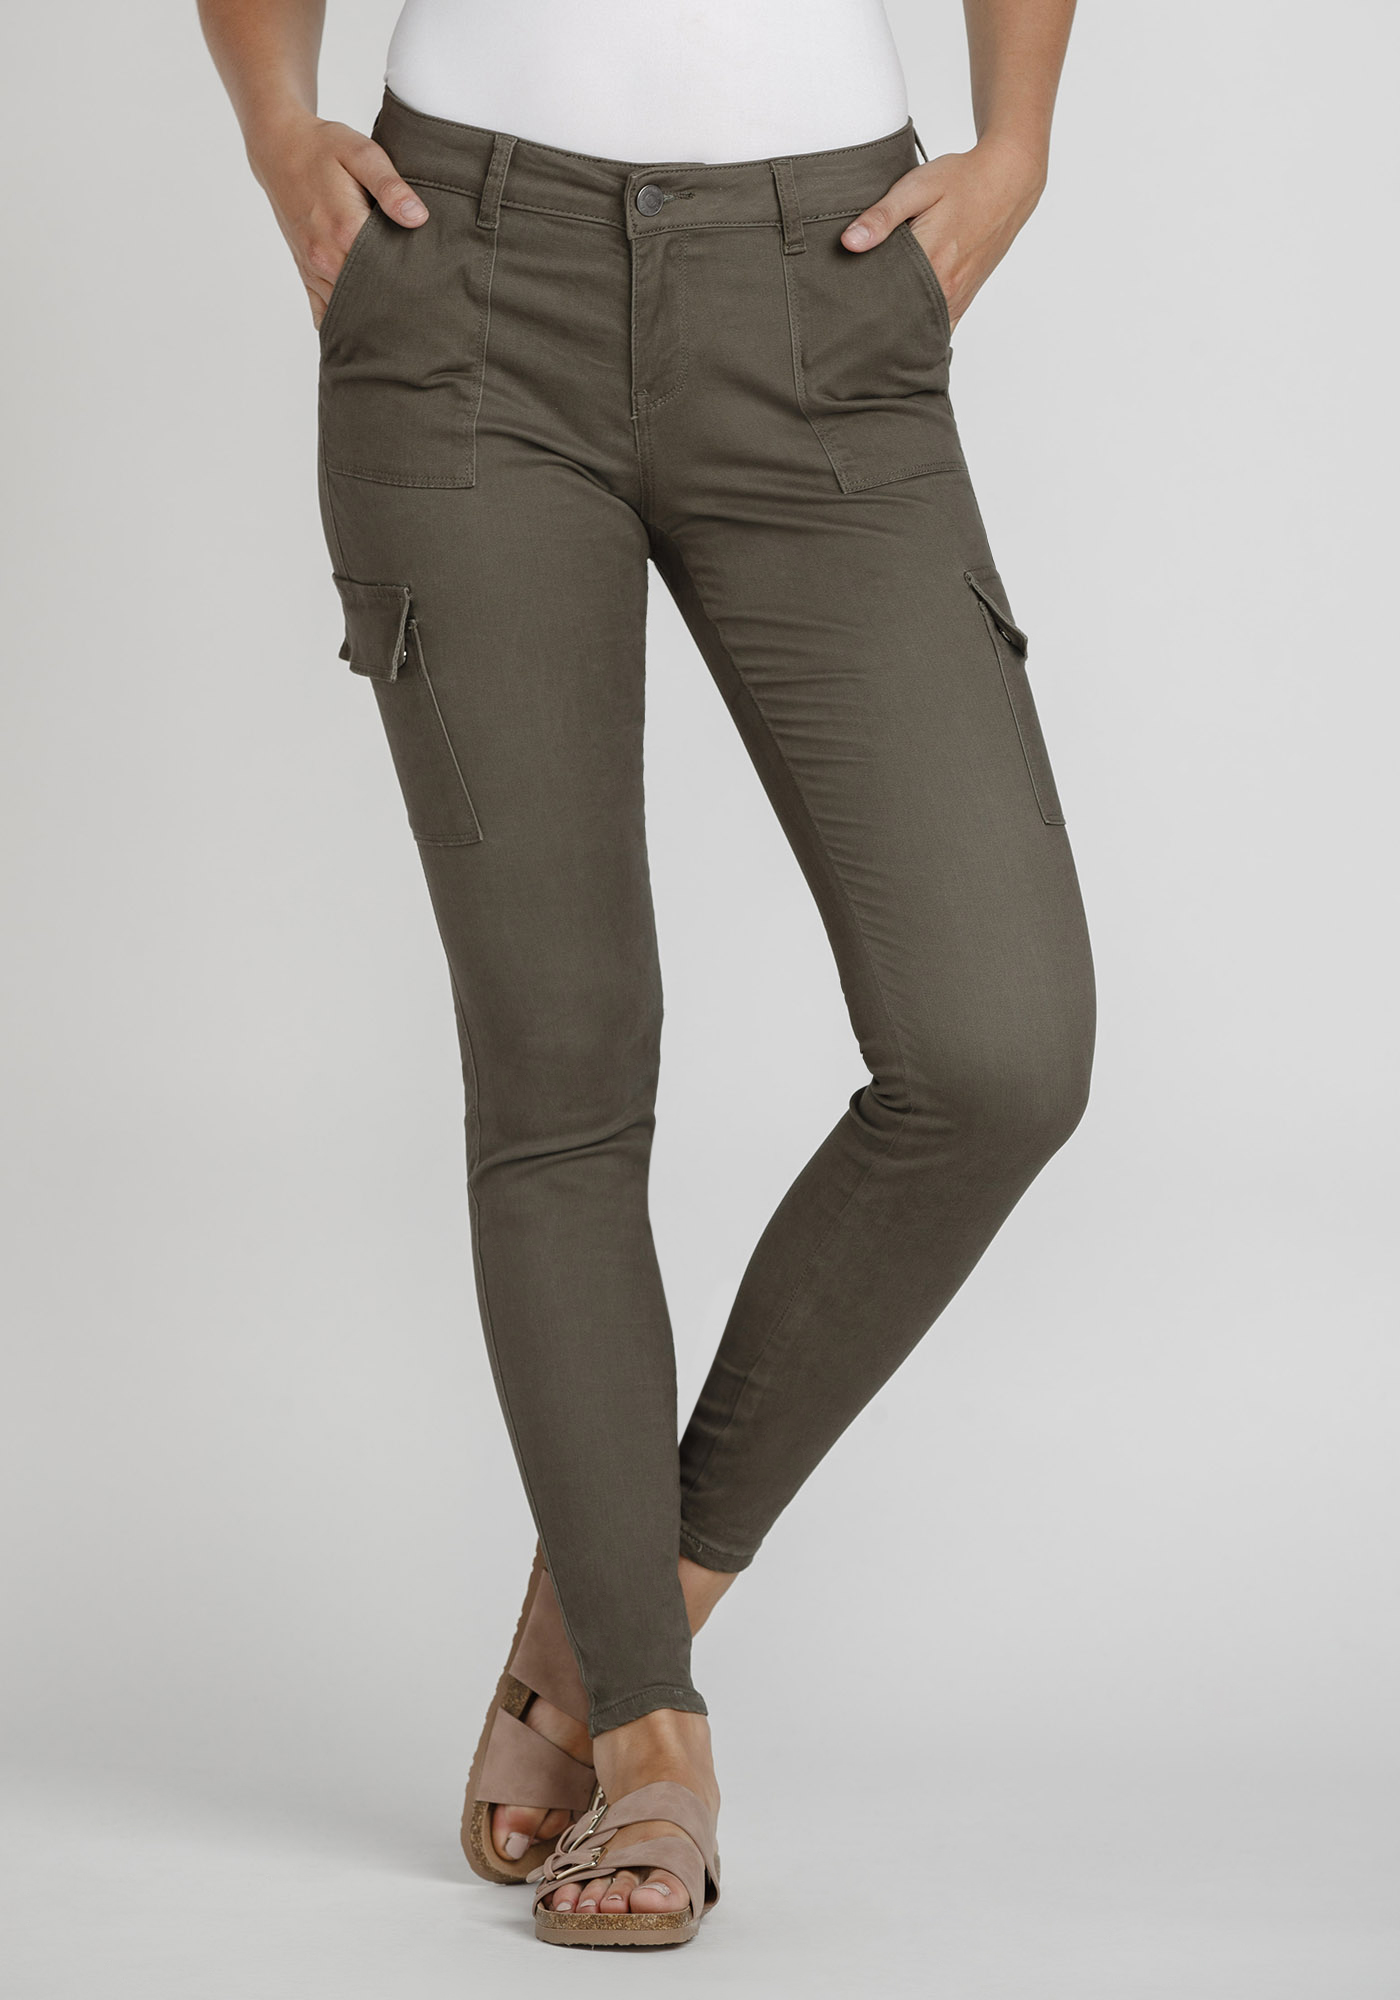 Womens Skinny Cargo Pant Warehouse One